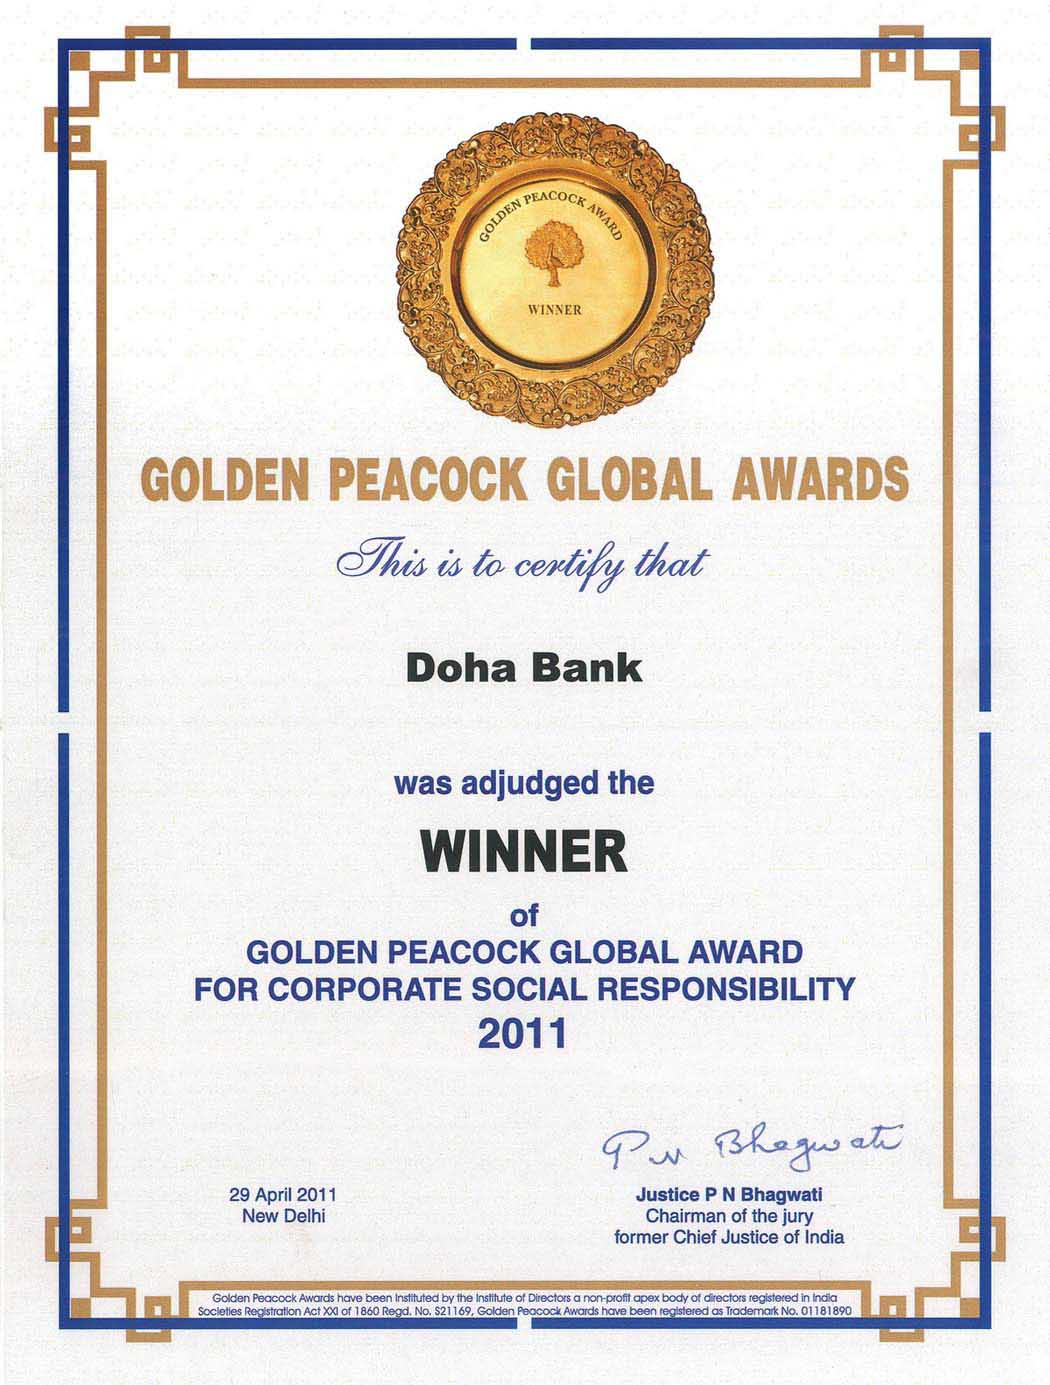 Golden Peacock Global Award 2011